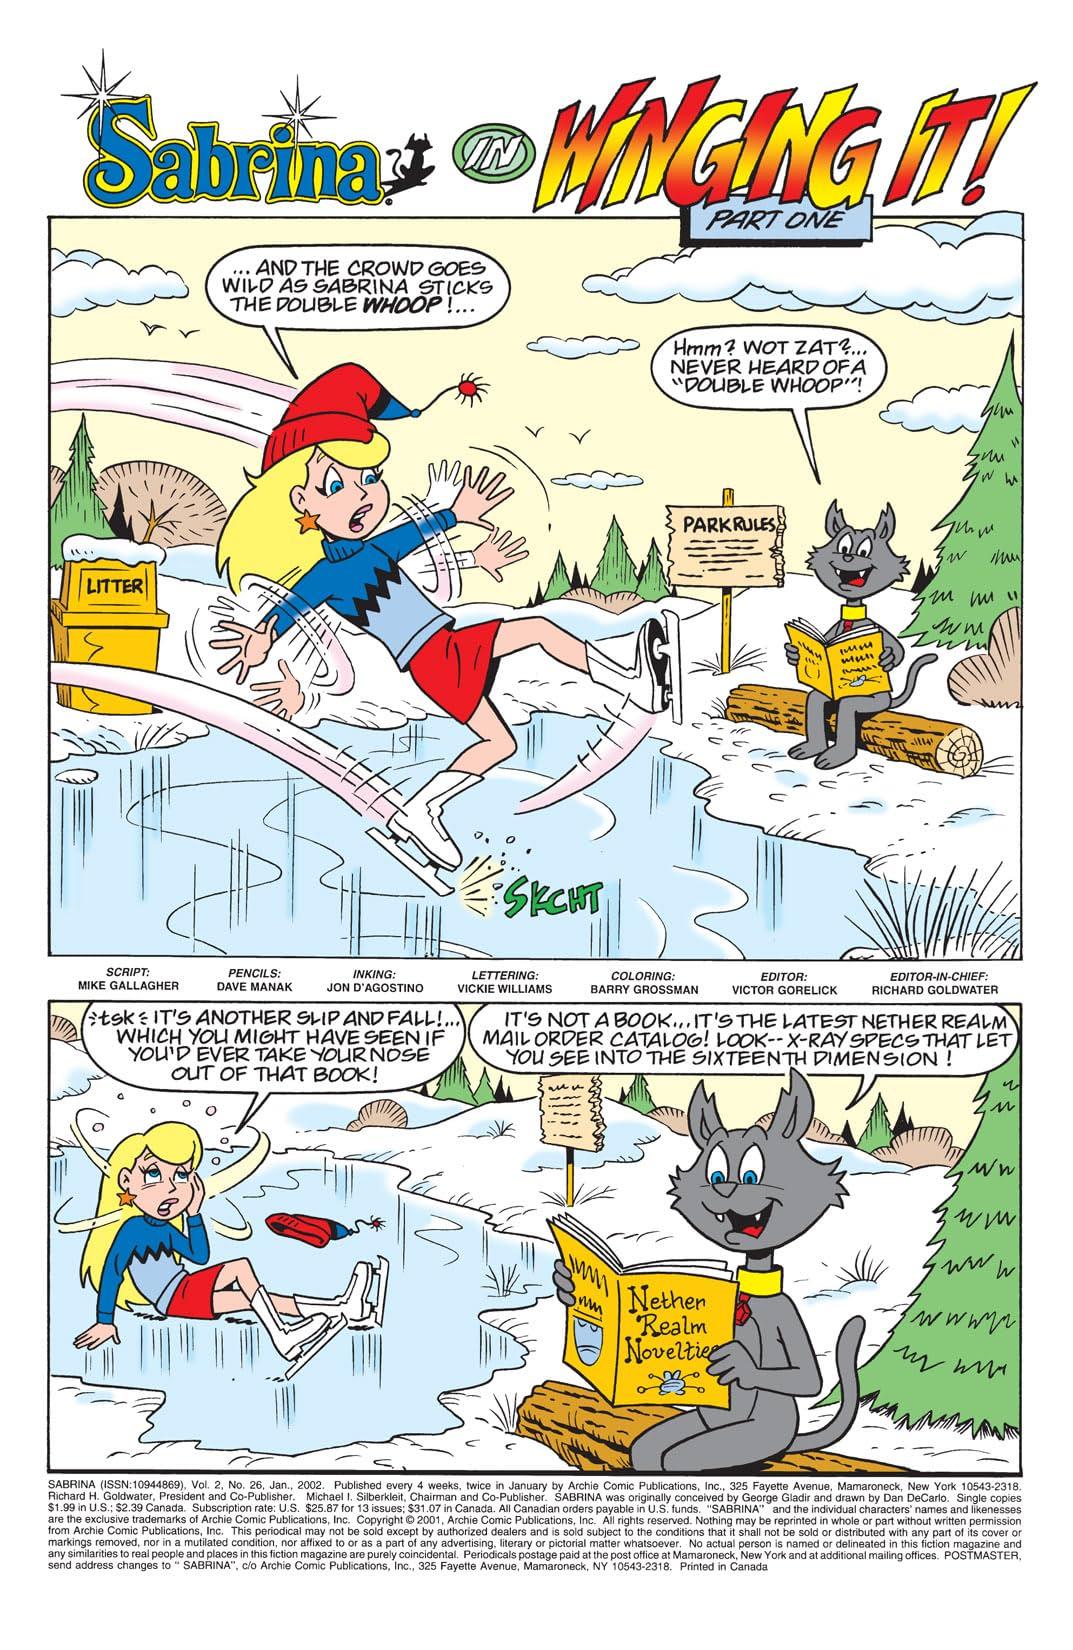 Sabrina the Teenage Witch Animated Series #26